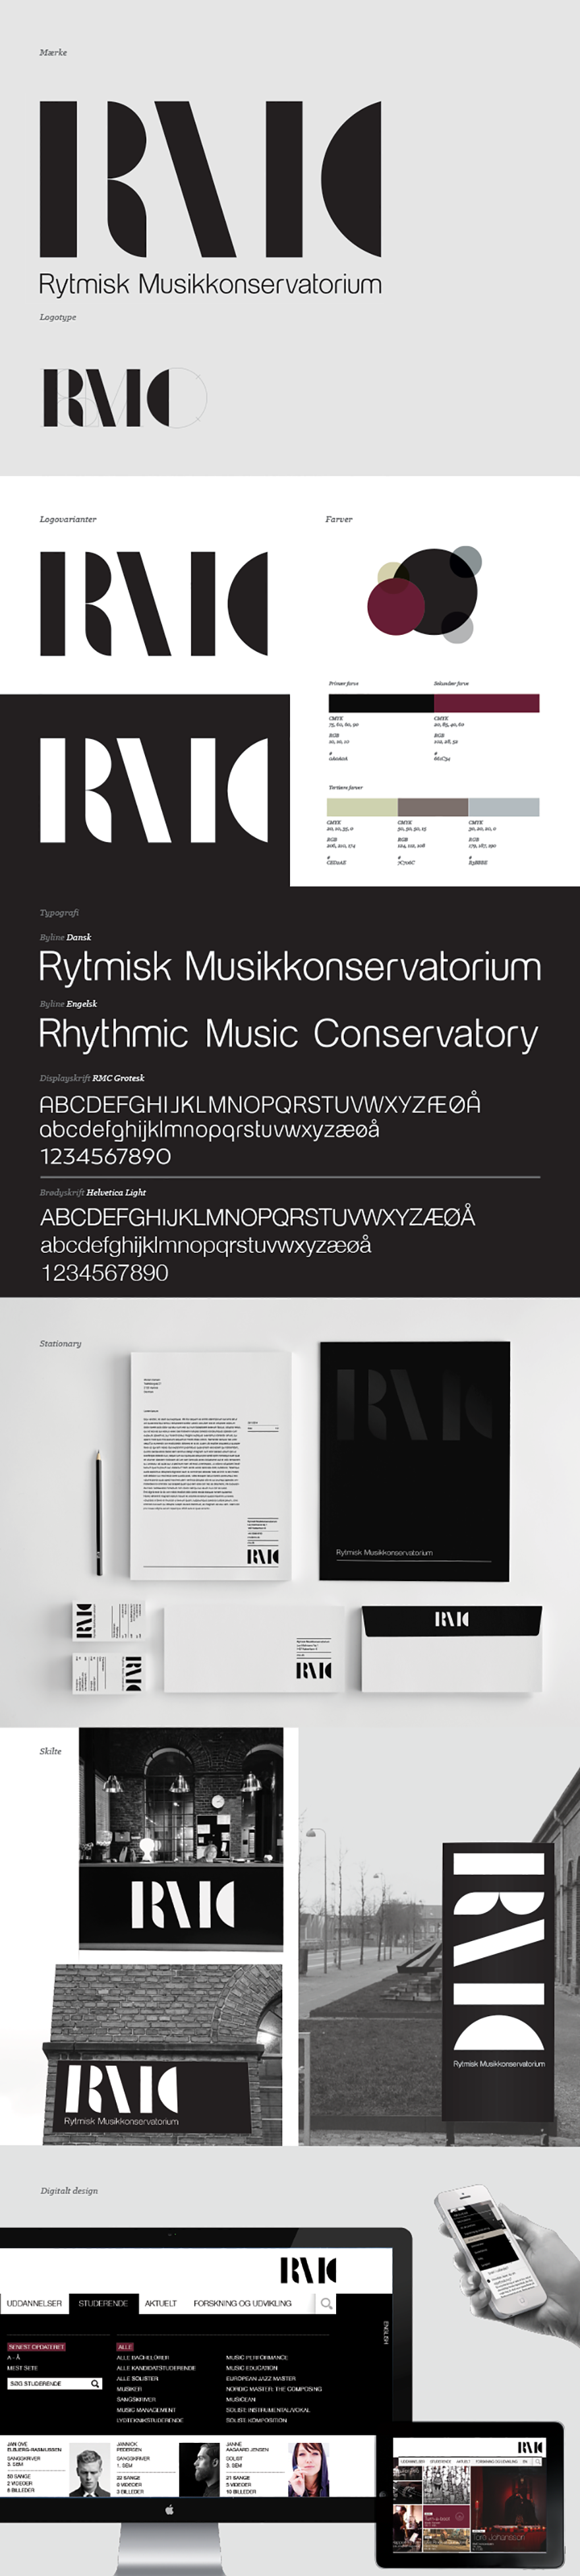 RMC - identitet